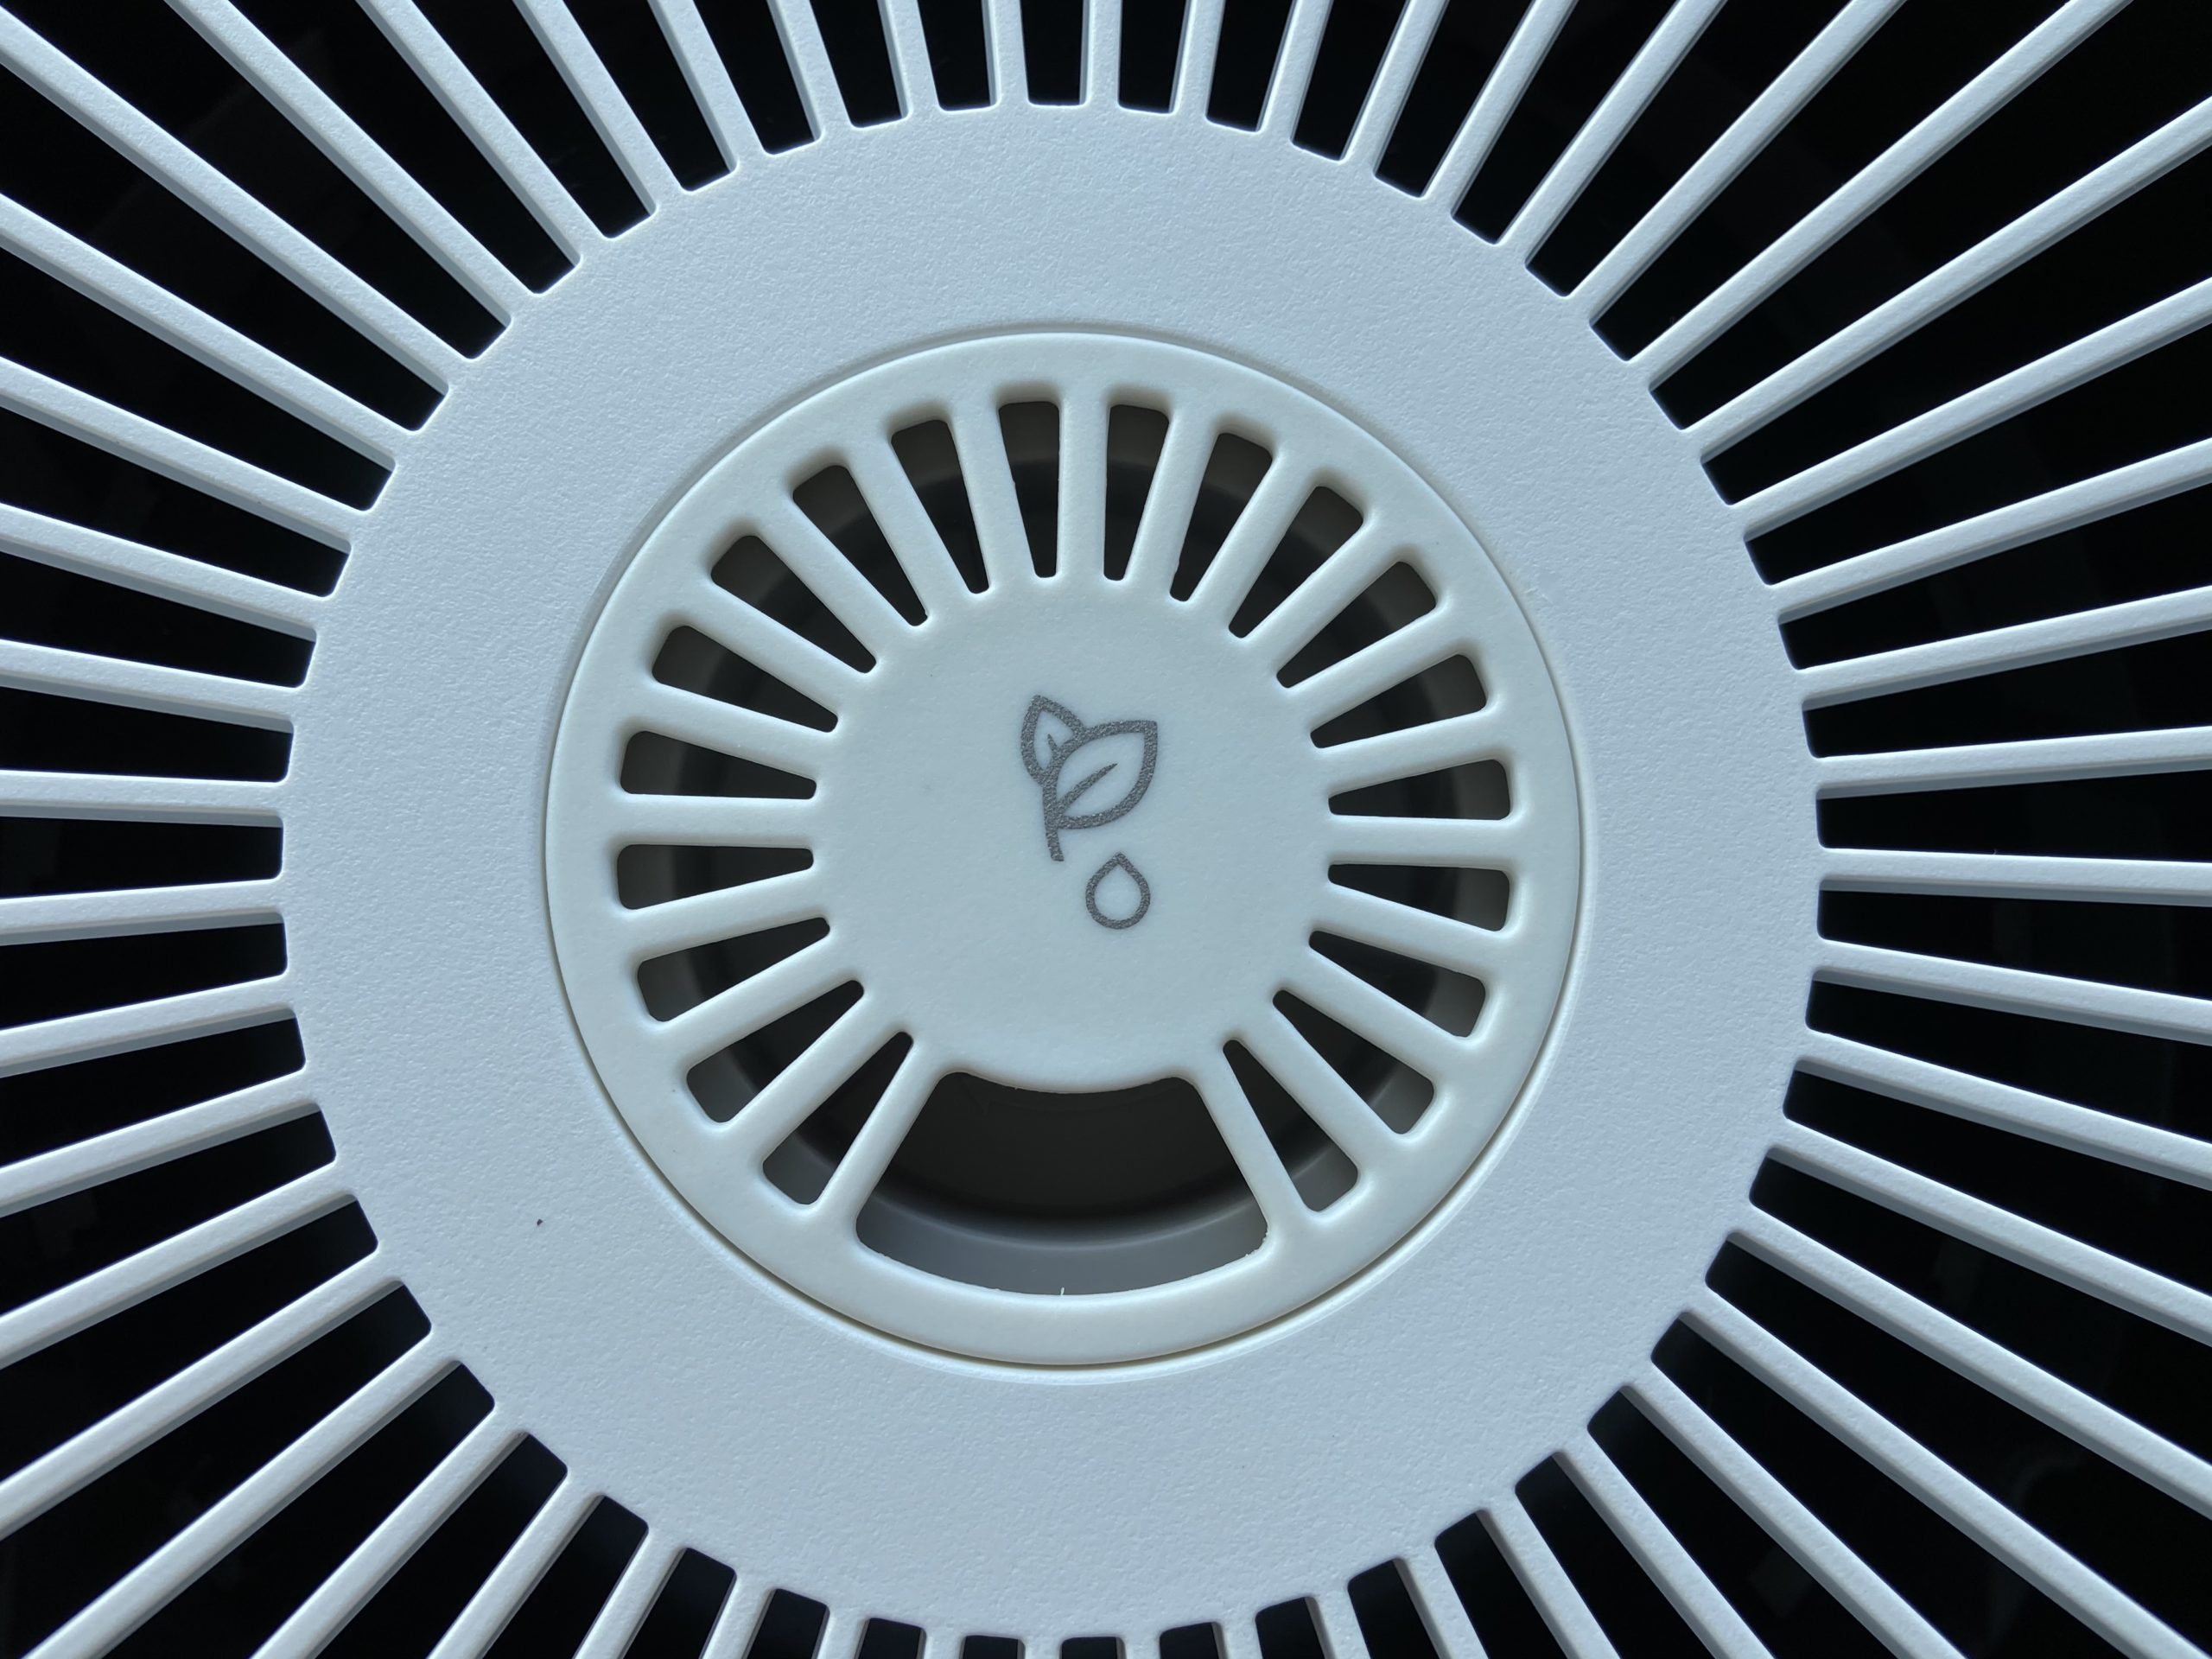 Honeywell HPA 830 淨香氛空氣清淨機 精油凹槽 圖2